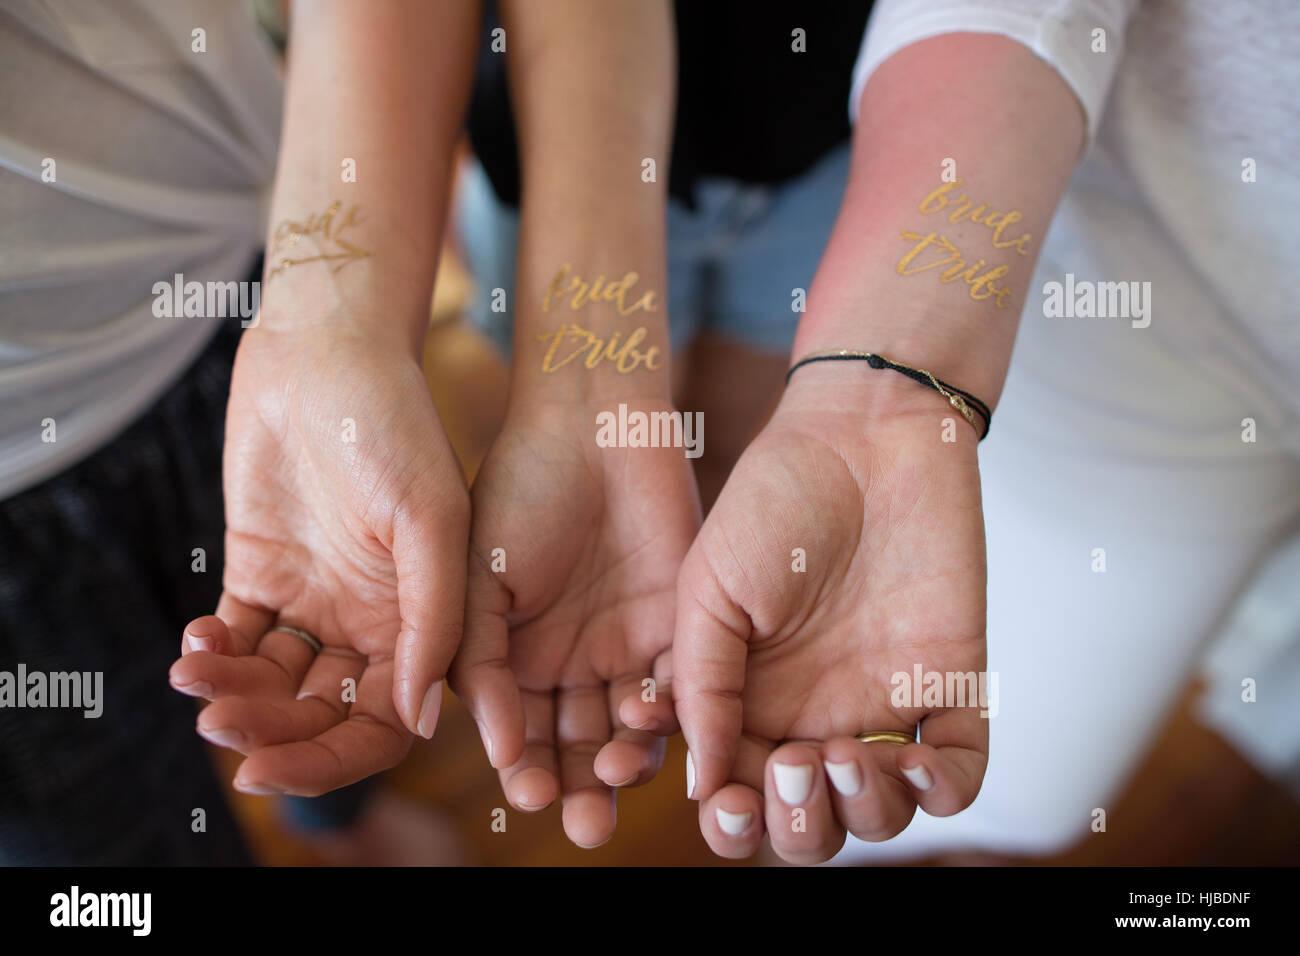 Tres Jóvenes Mujeres Mostrando Novia Temporal Tribu Tatuajes En